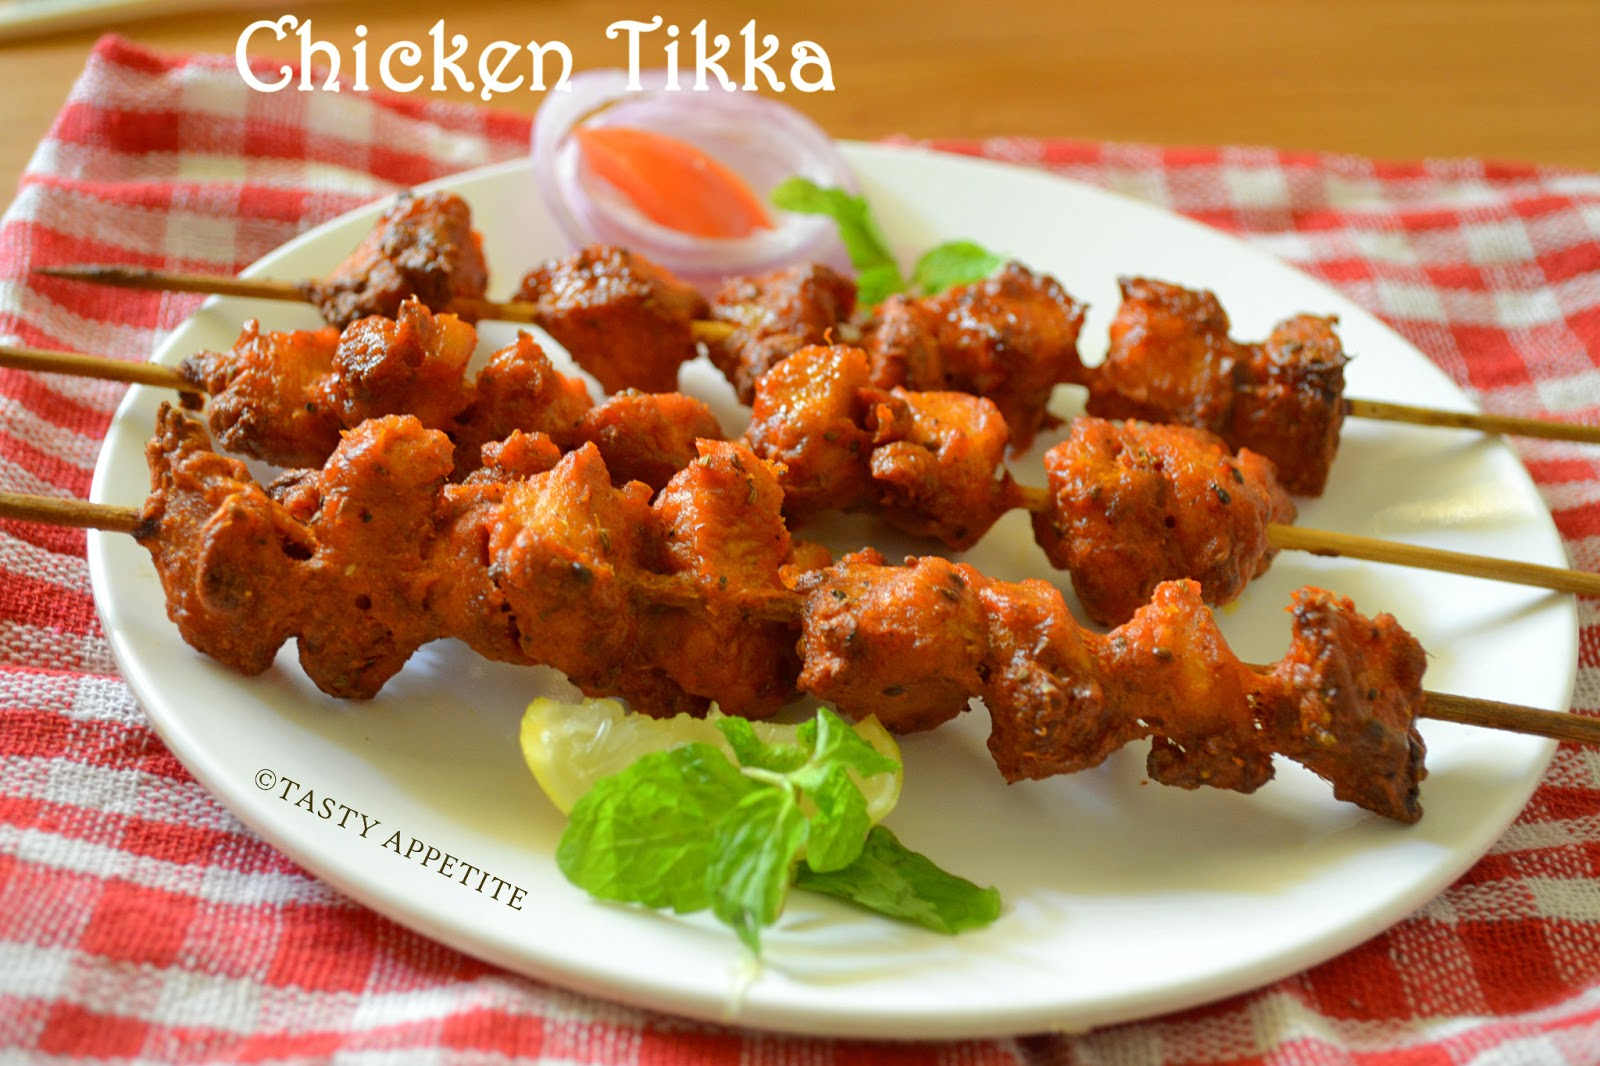 How To Make Chicken Tikka Easy Step By Step Recipe